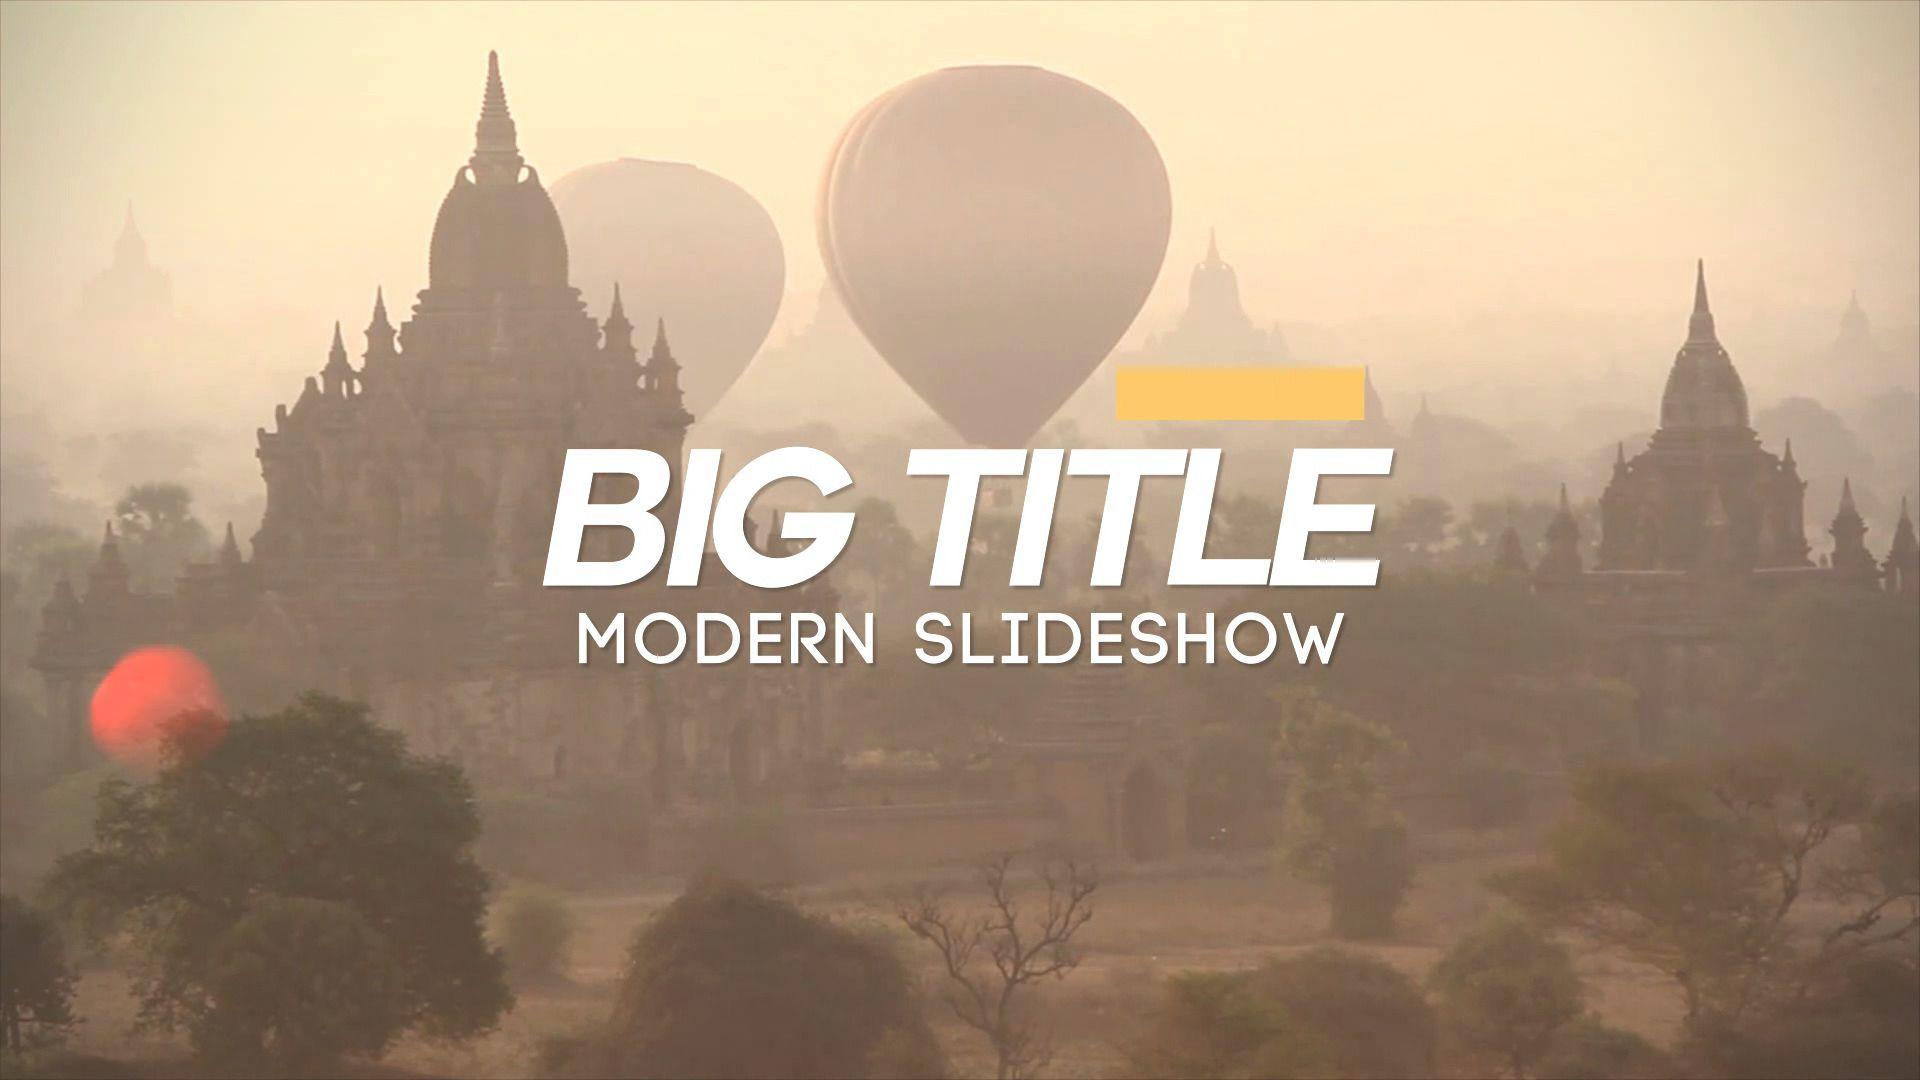 Big Title Slideshow - 7